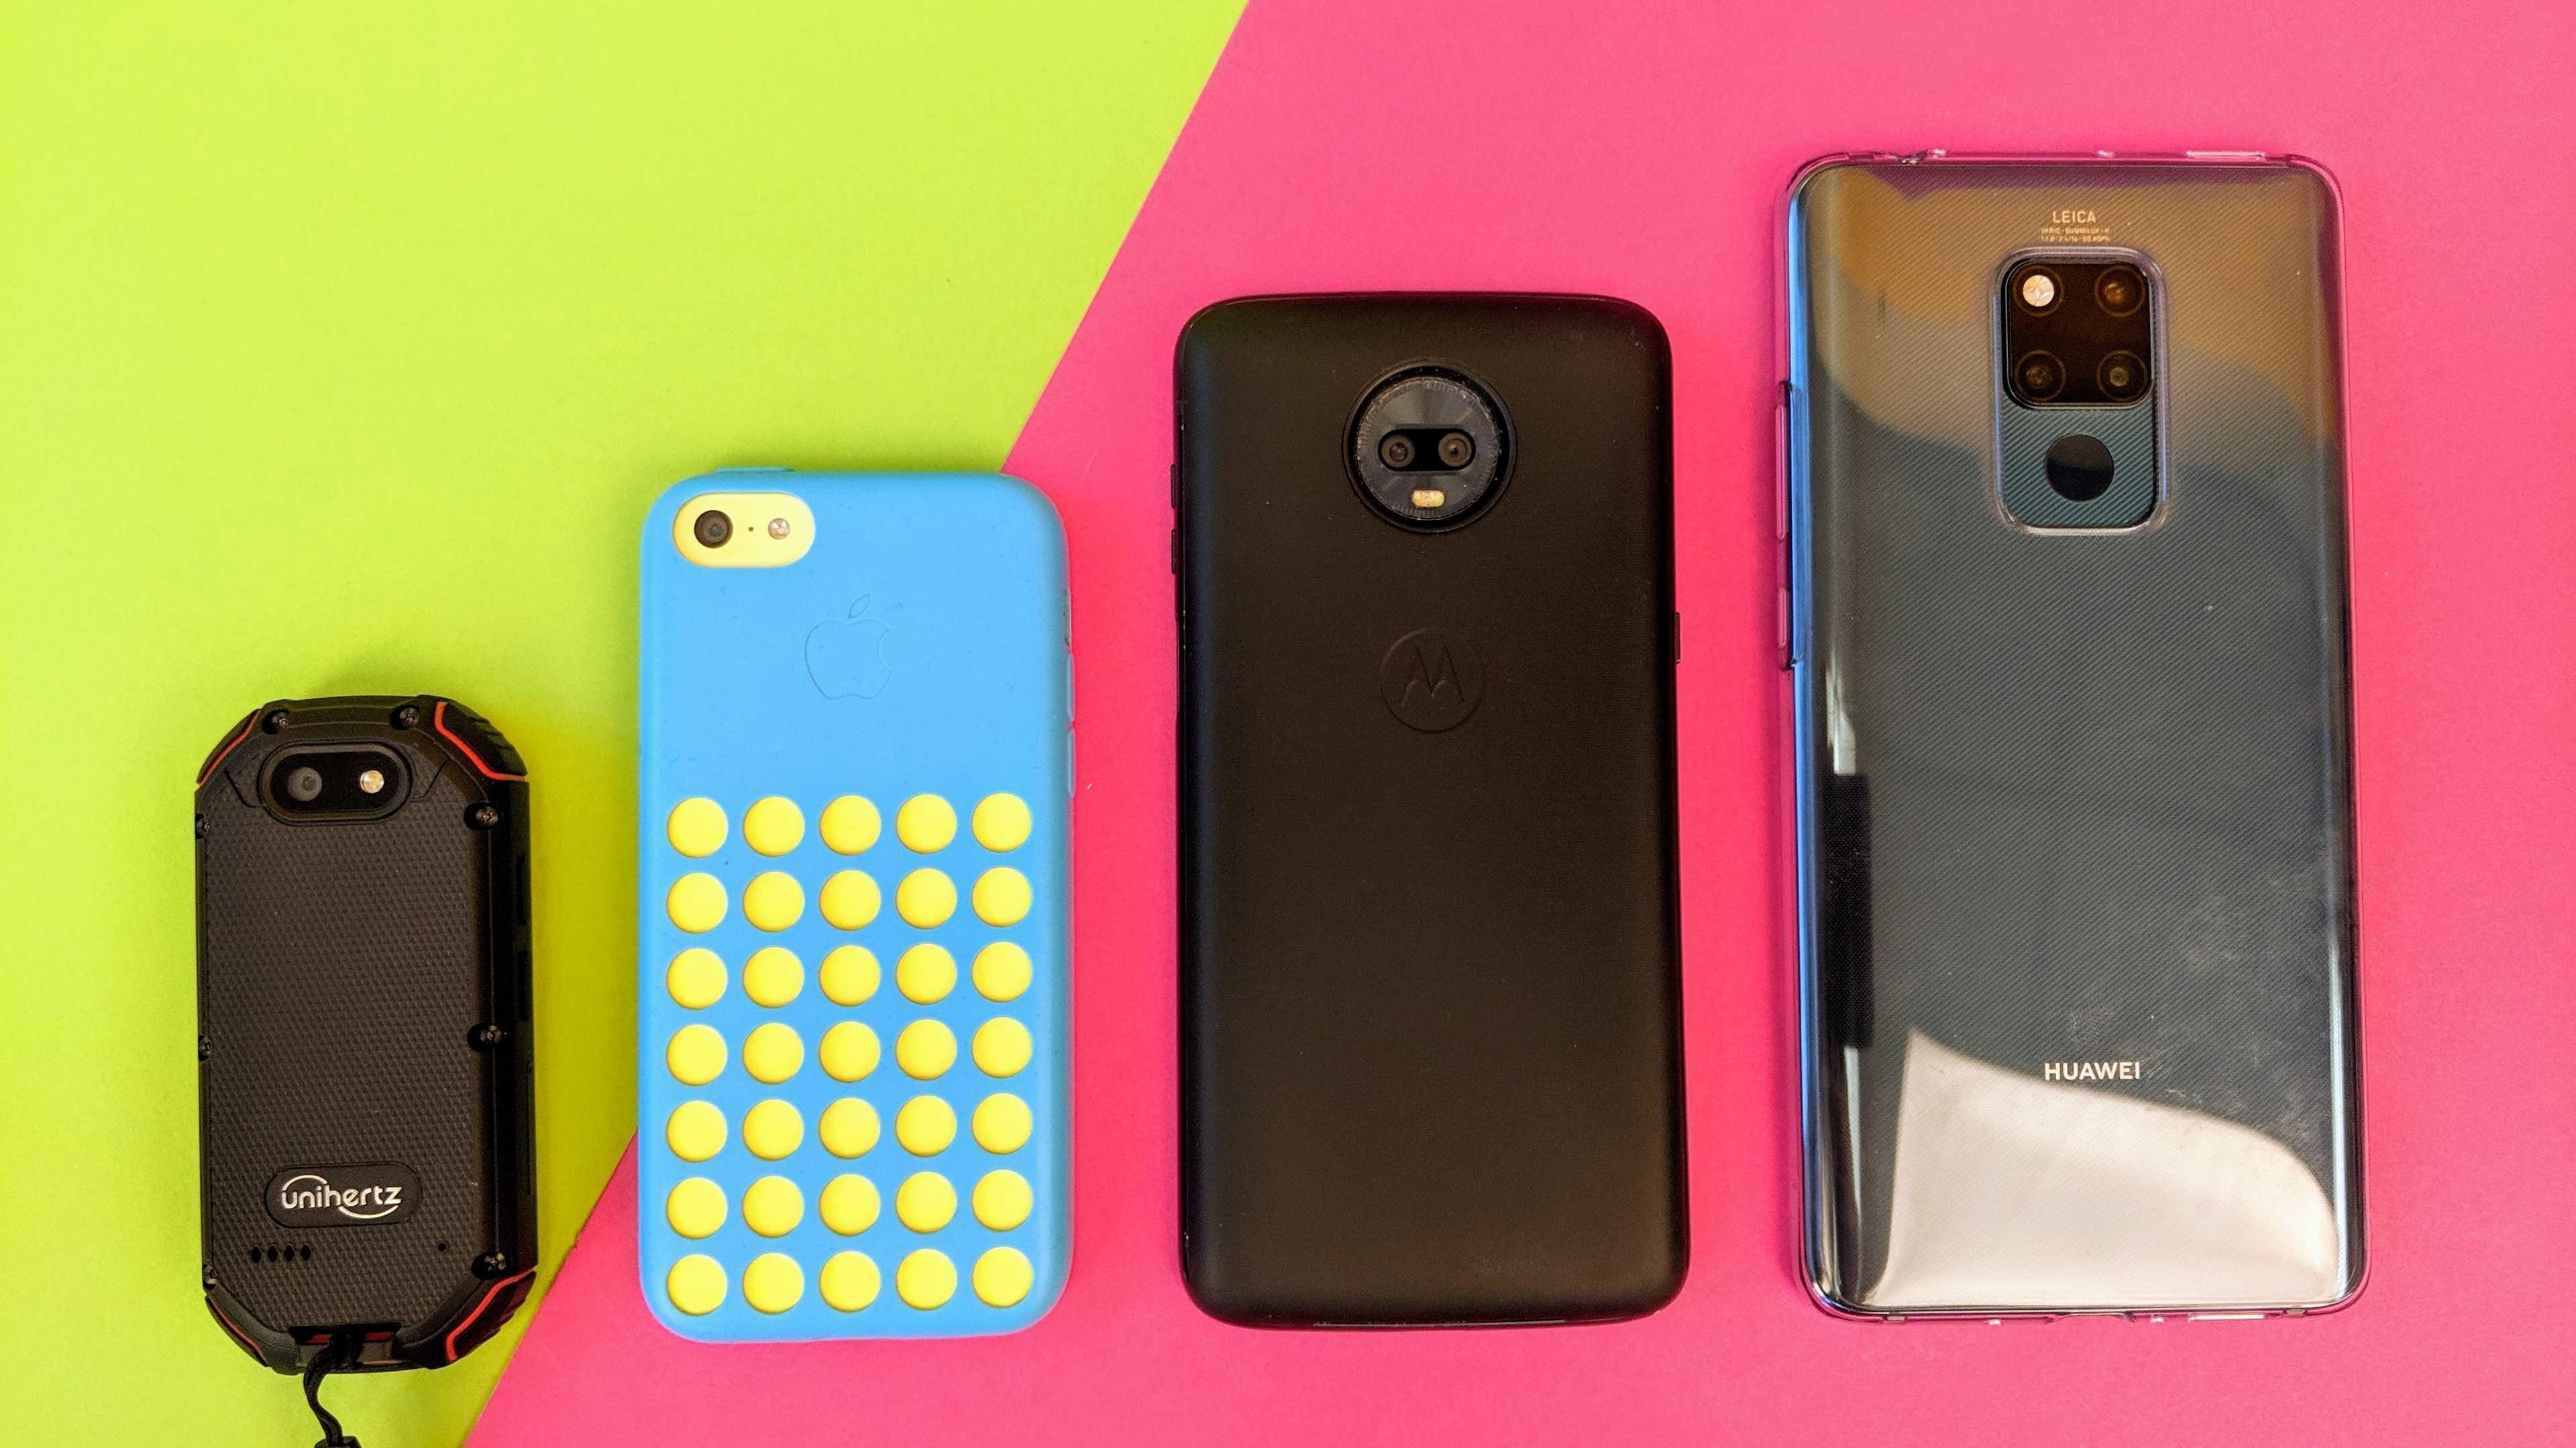 Kaufberatung Display-Zwerge: Android-Smartphones bis 4 Zoll